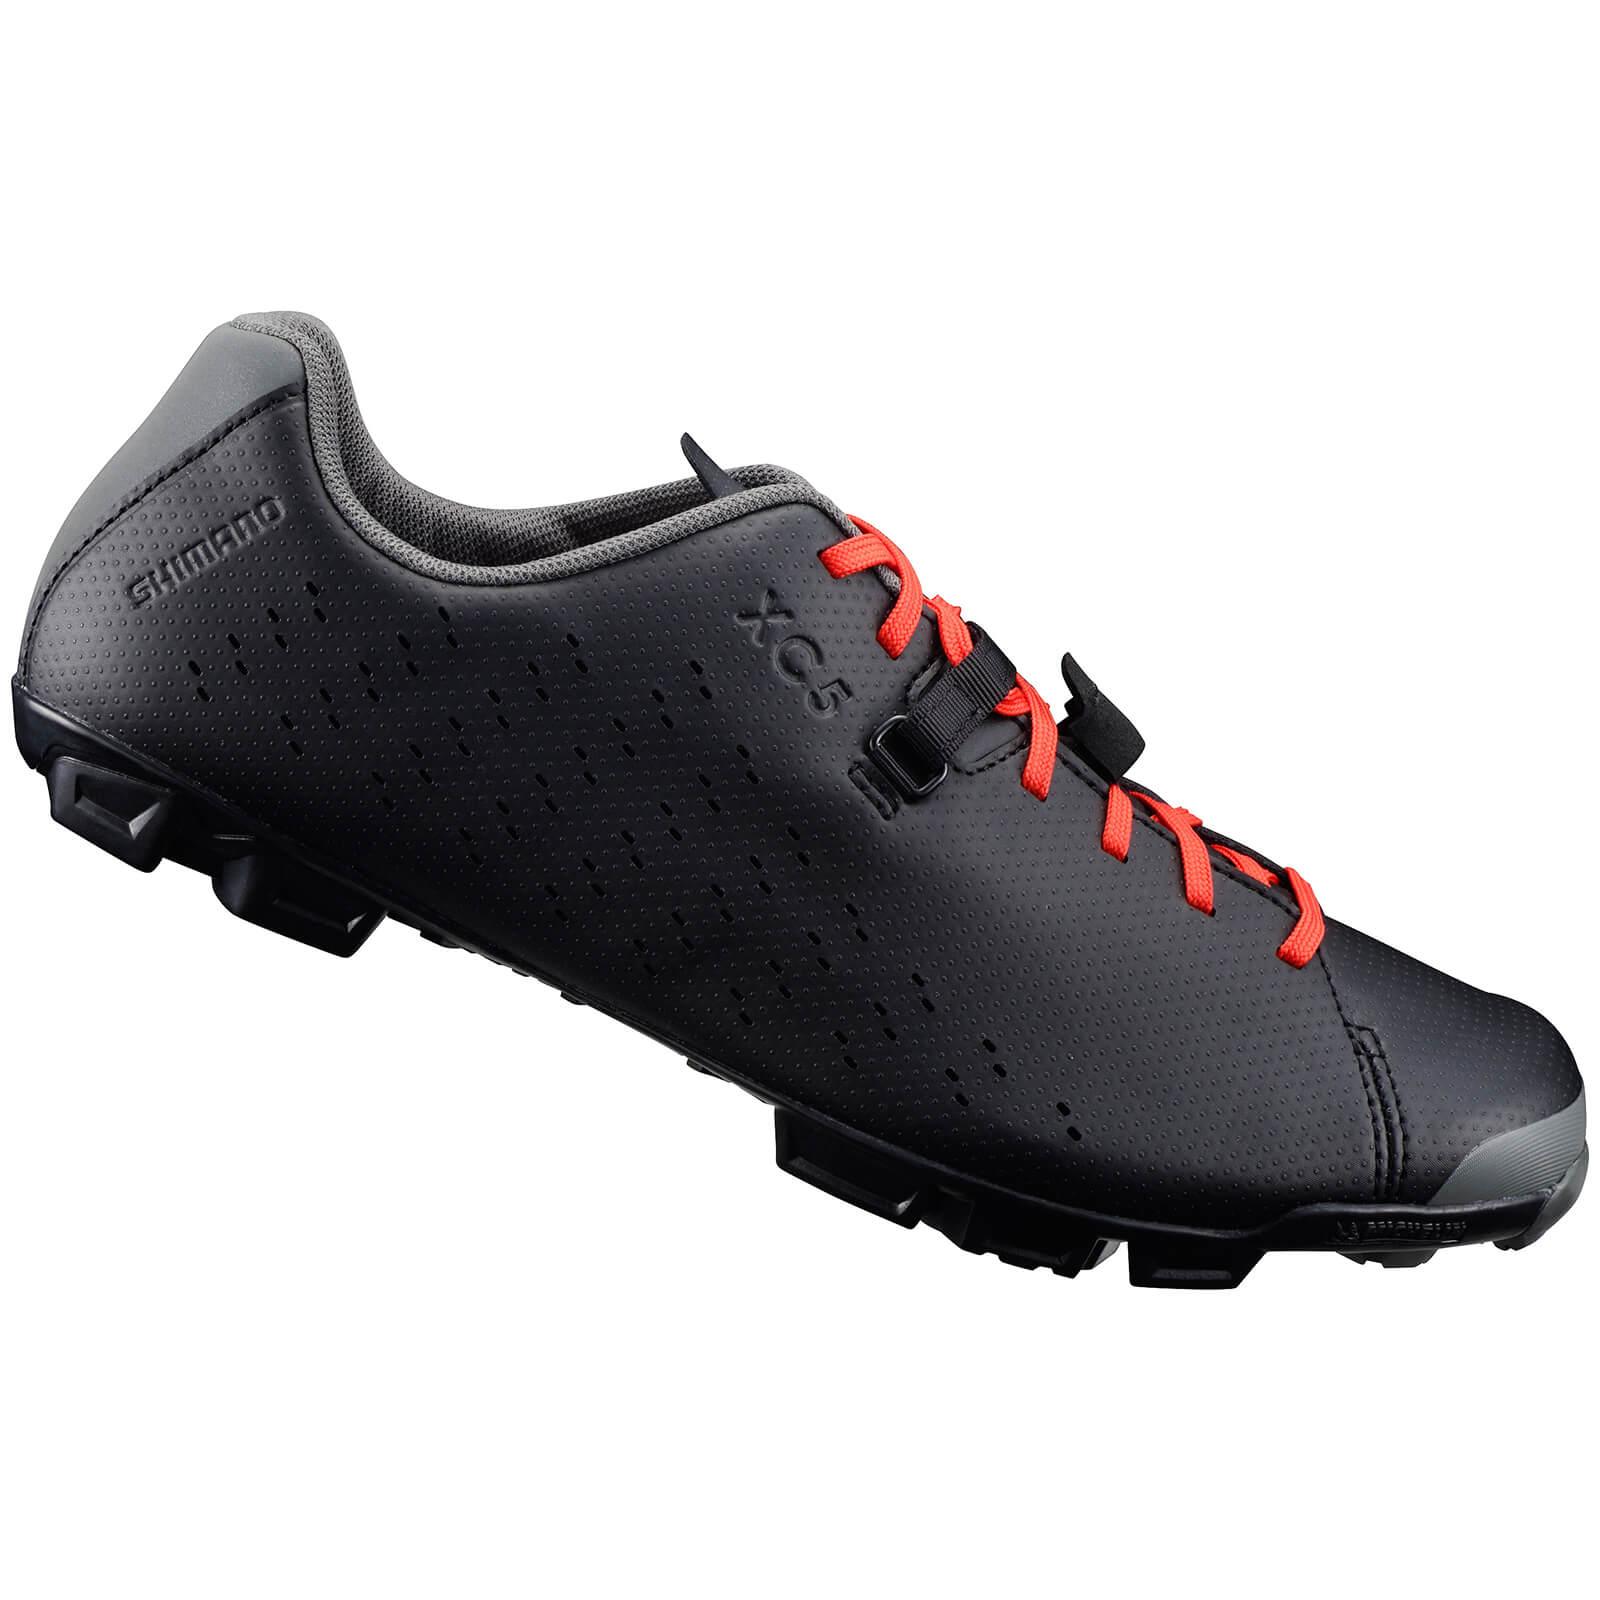 Shimano XC5 MTB Shoes - Grey/Orange - EU 48 - Black